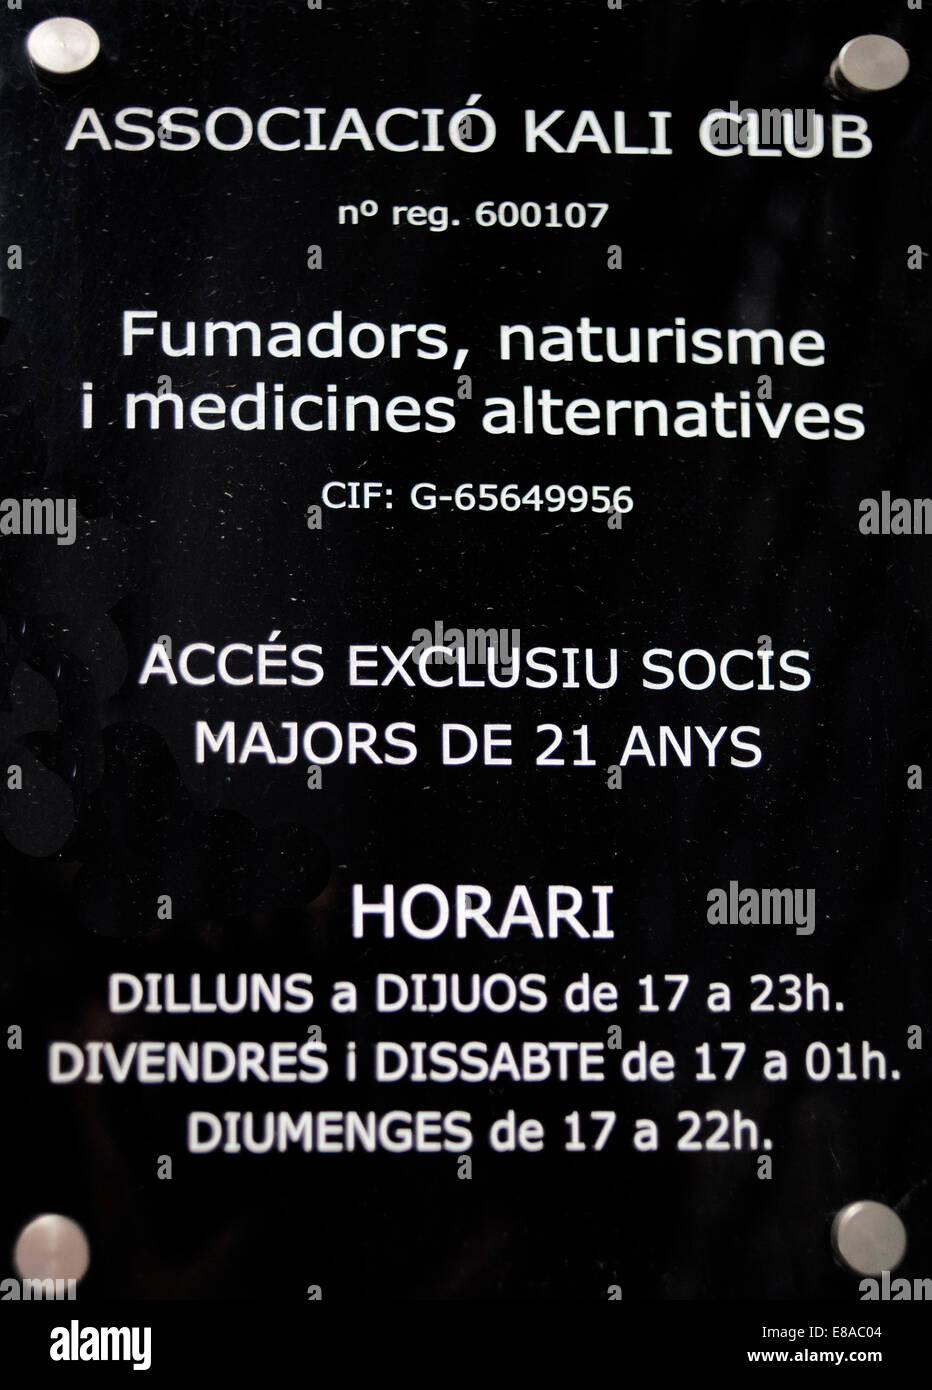 Rules of the Club Kali Cannabis association located in San Cugat, Barcelona.  BARCELONA COFFEE SHOPS CANNABIS Marijuana - Stock Image